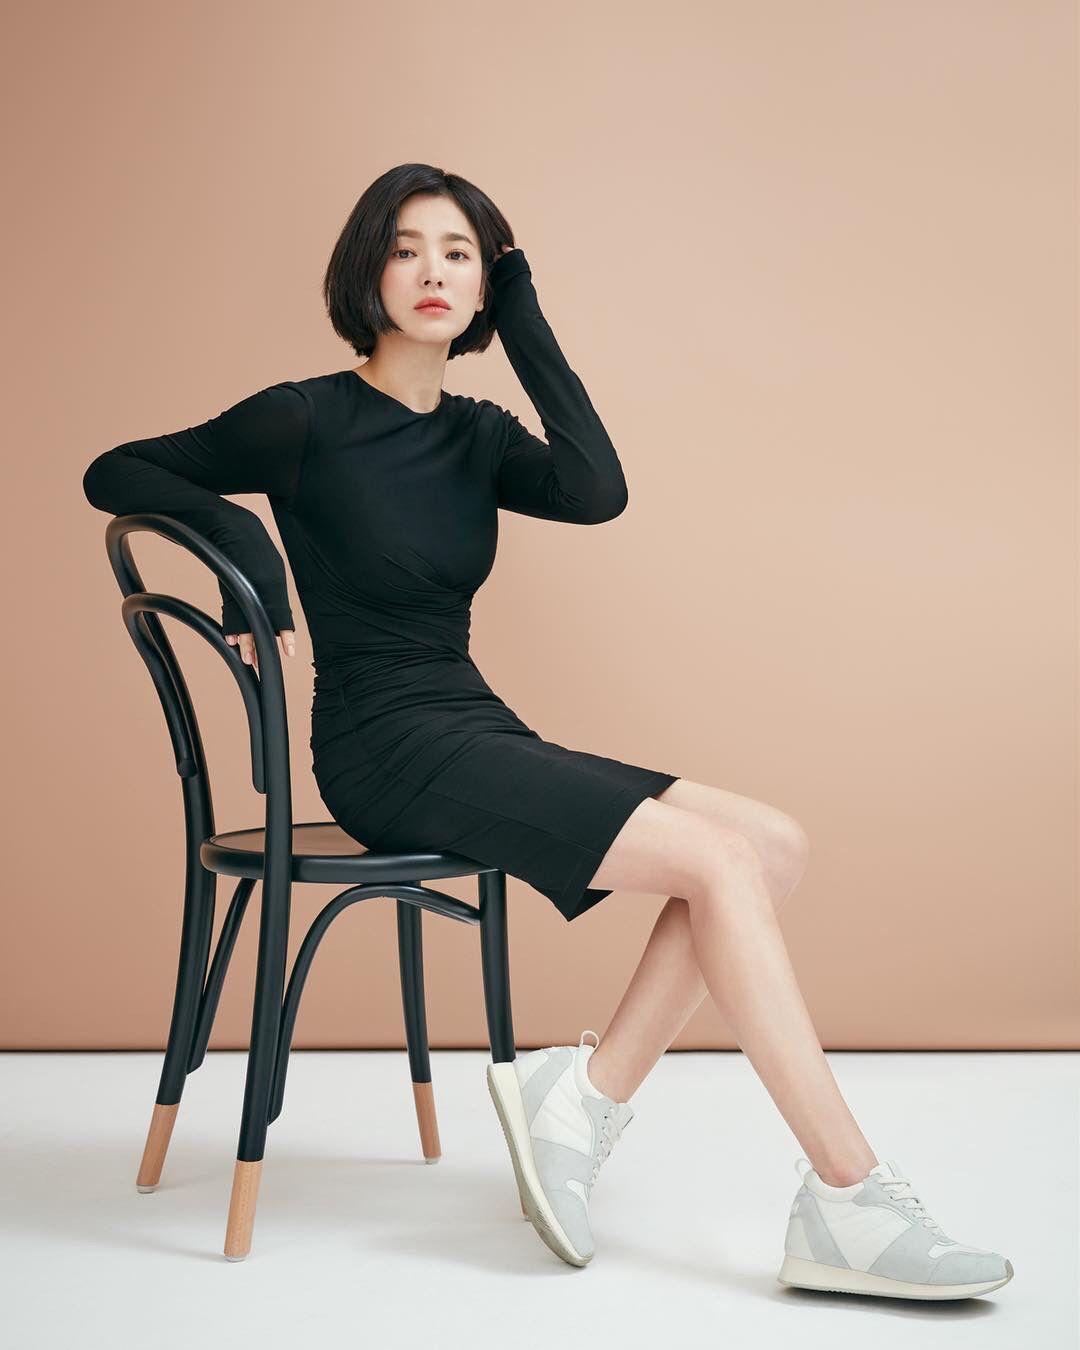 Song hye kyo 2018 | Model pakaian, Song hye kyo, Rambut ...